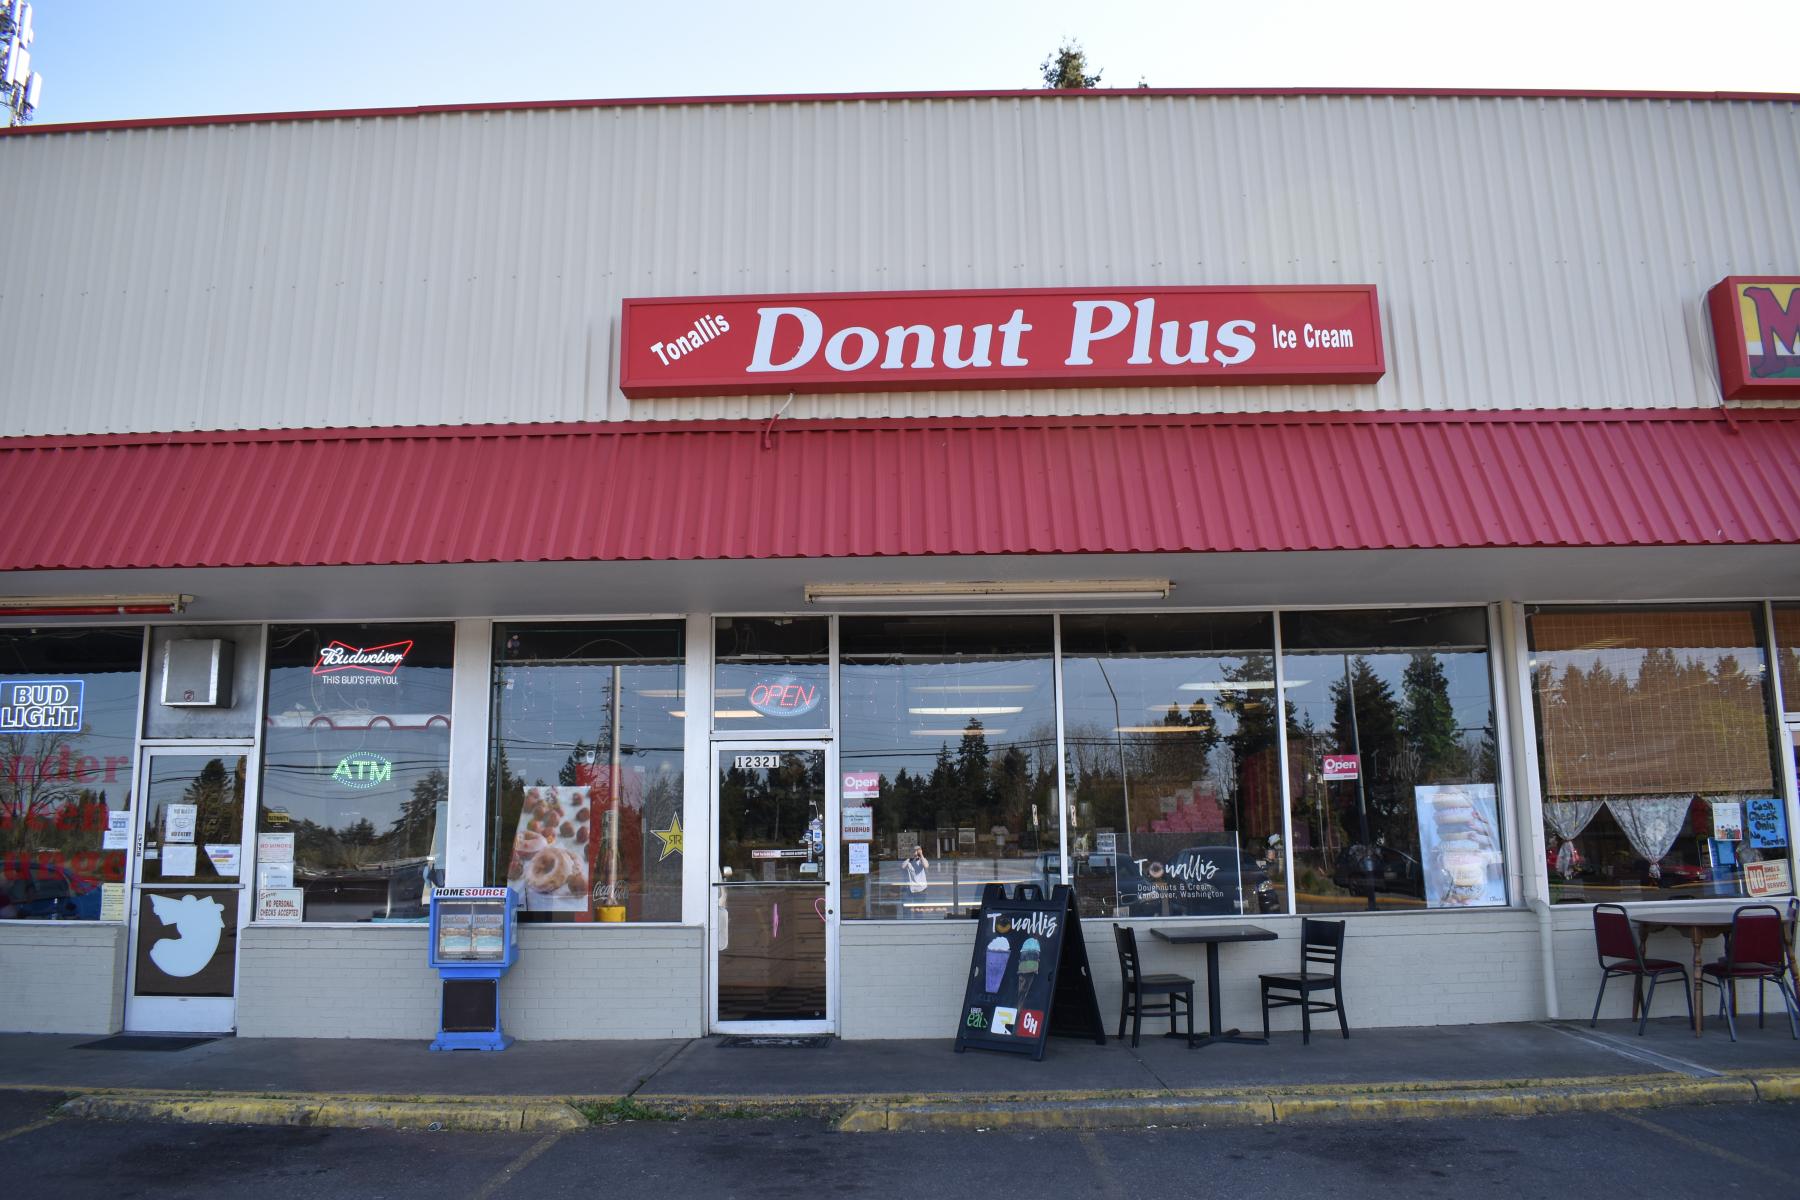 Tonallis Donuts and Cream